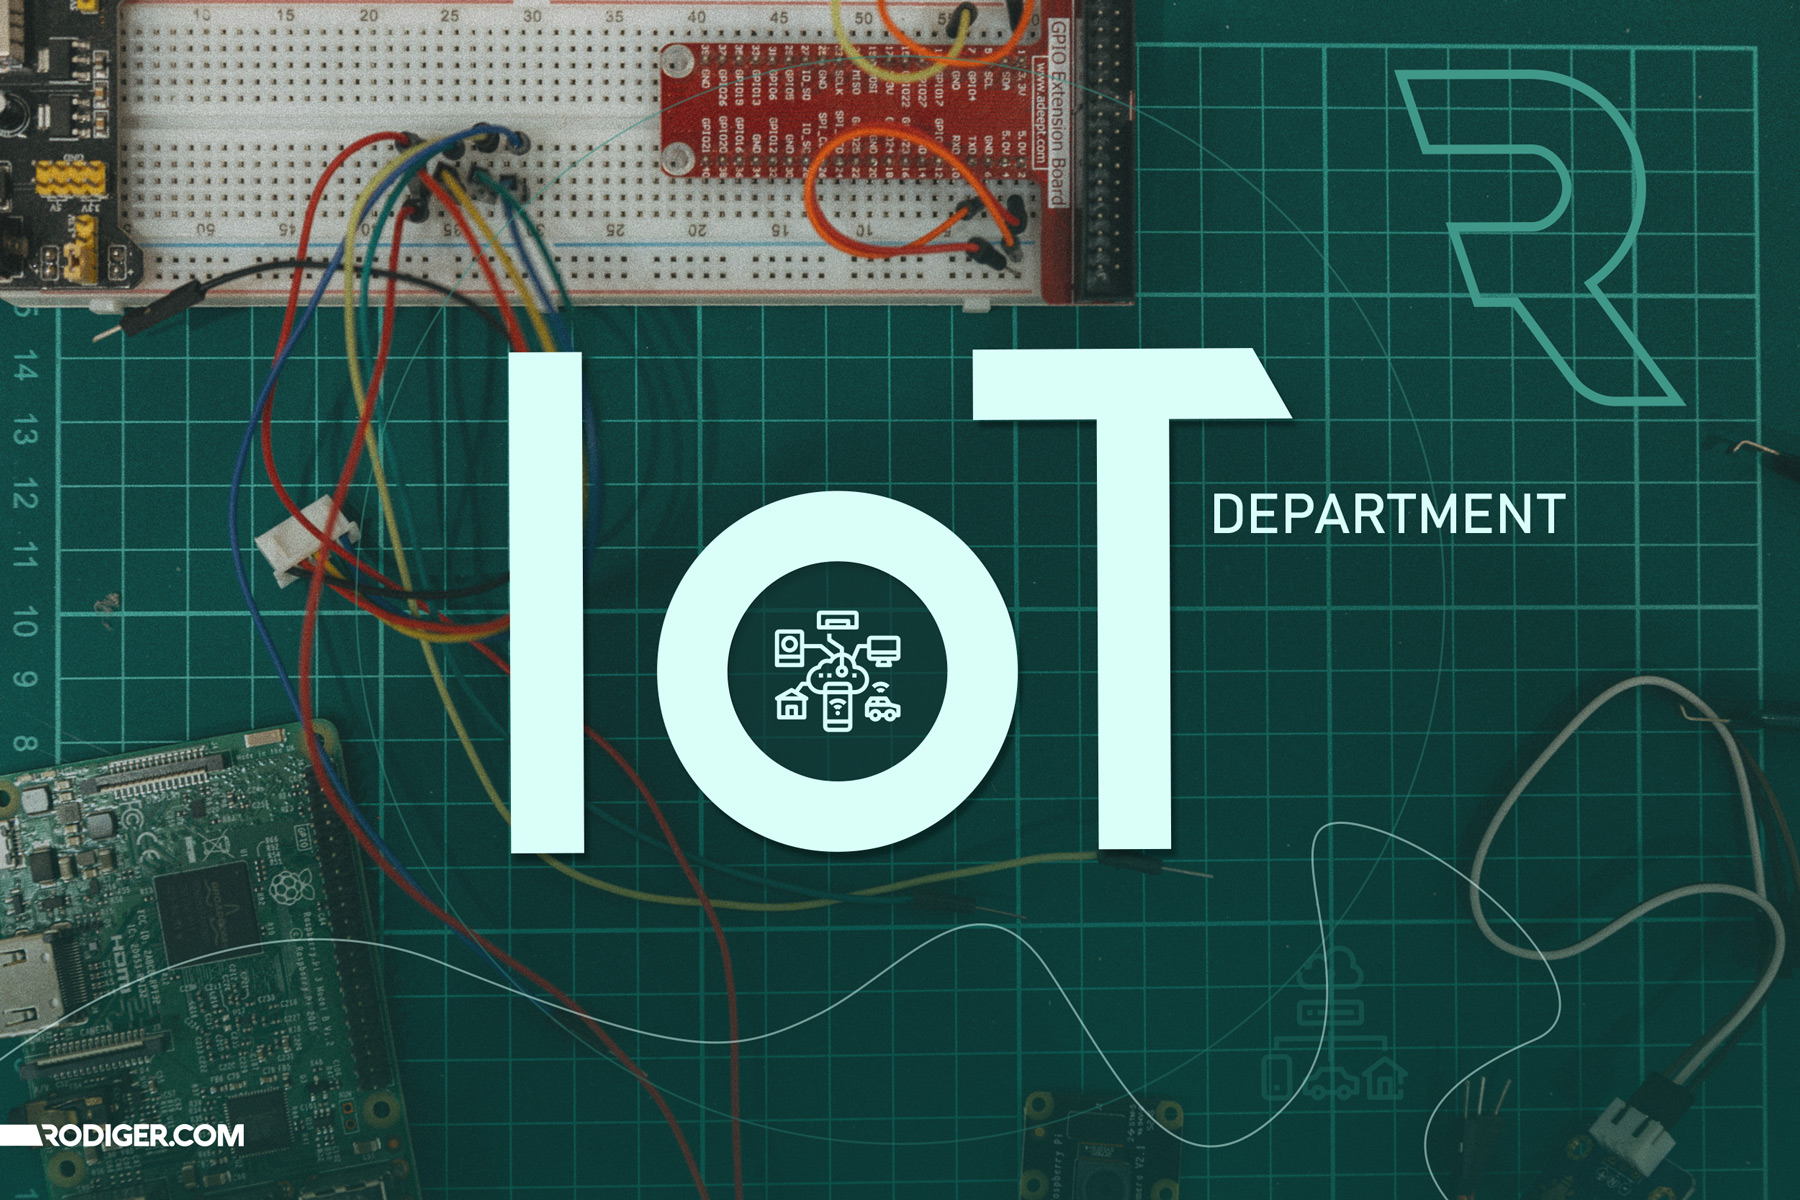 IoT department